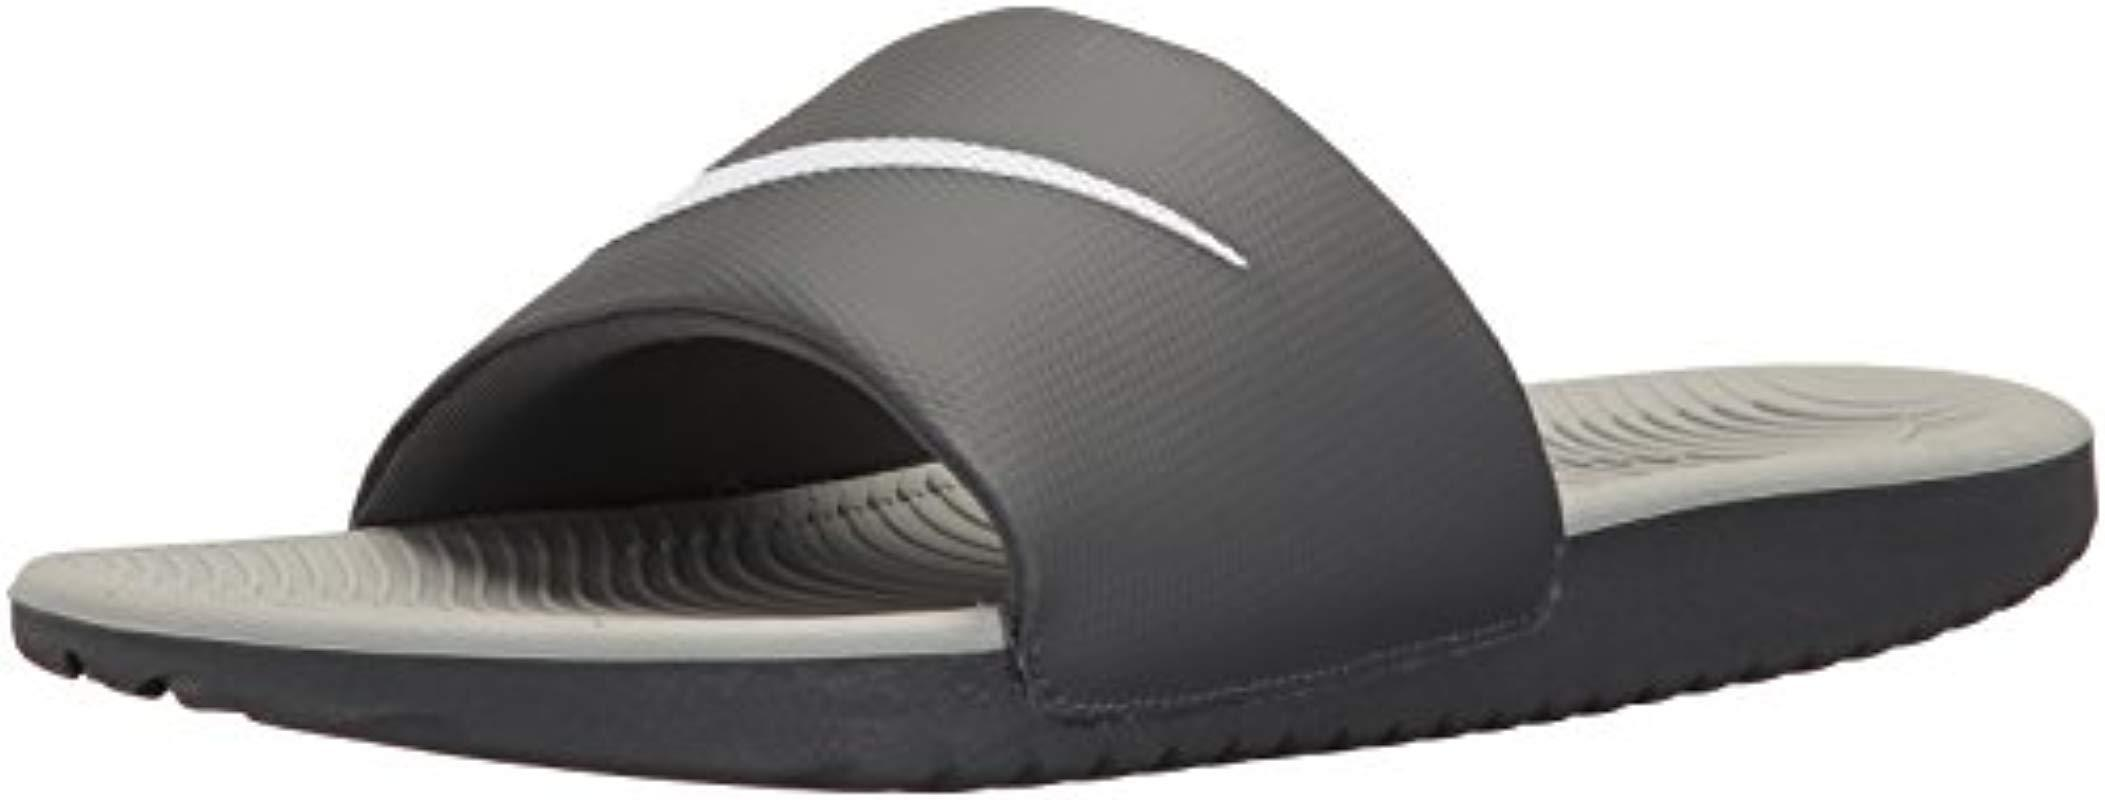 647079dcabb7 Nike  s Kawa Slide Low-top Sneakers in Gray for Men - Lyst